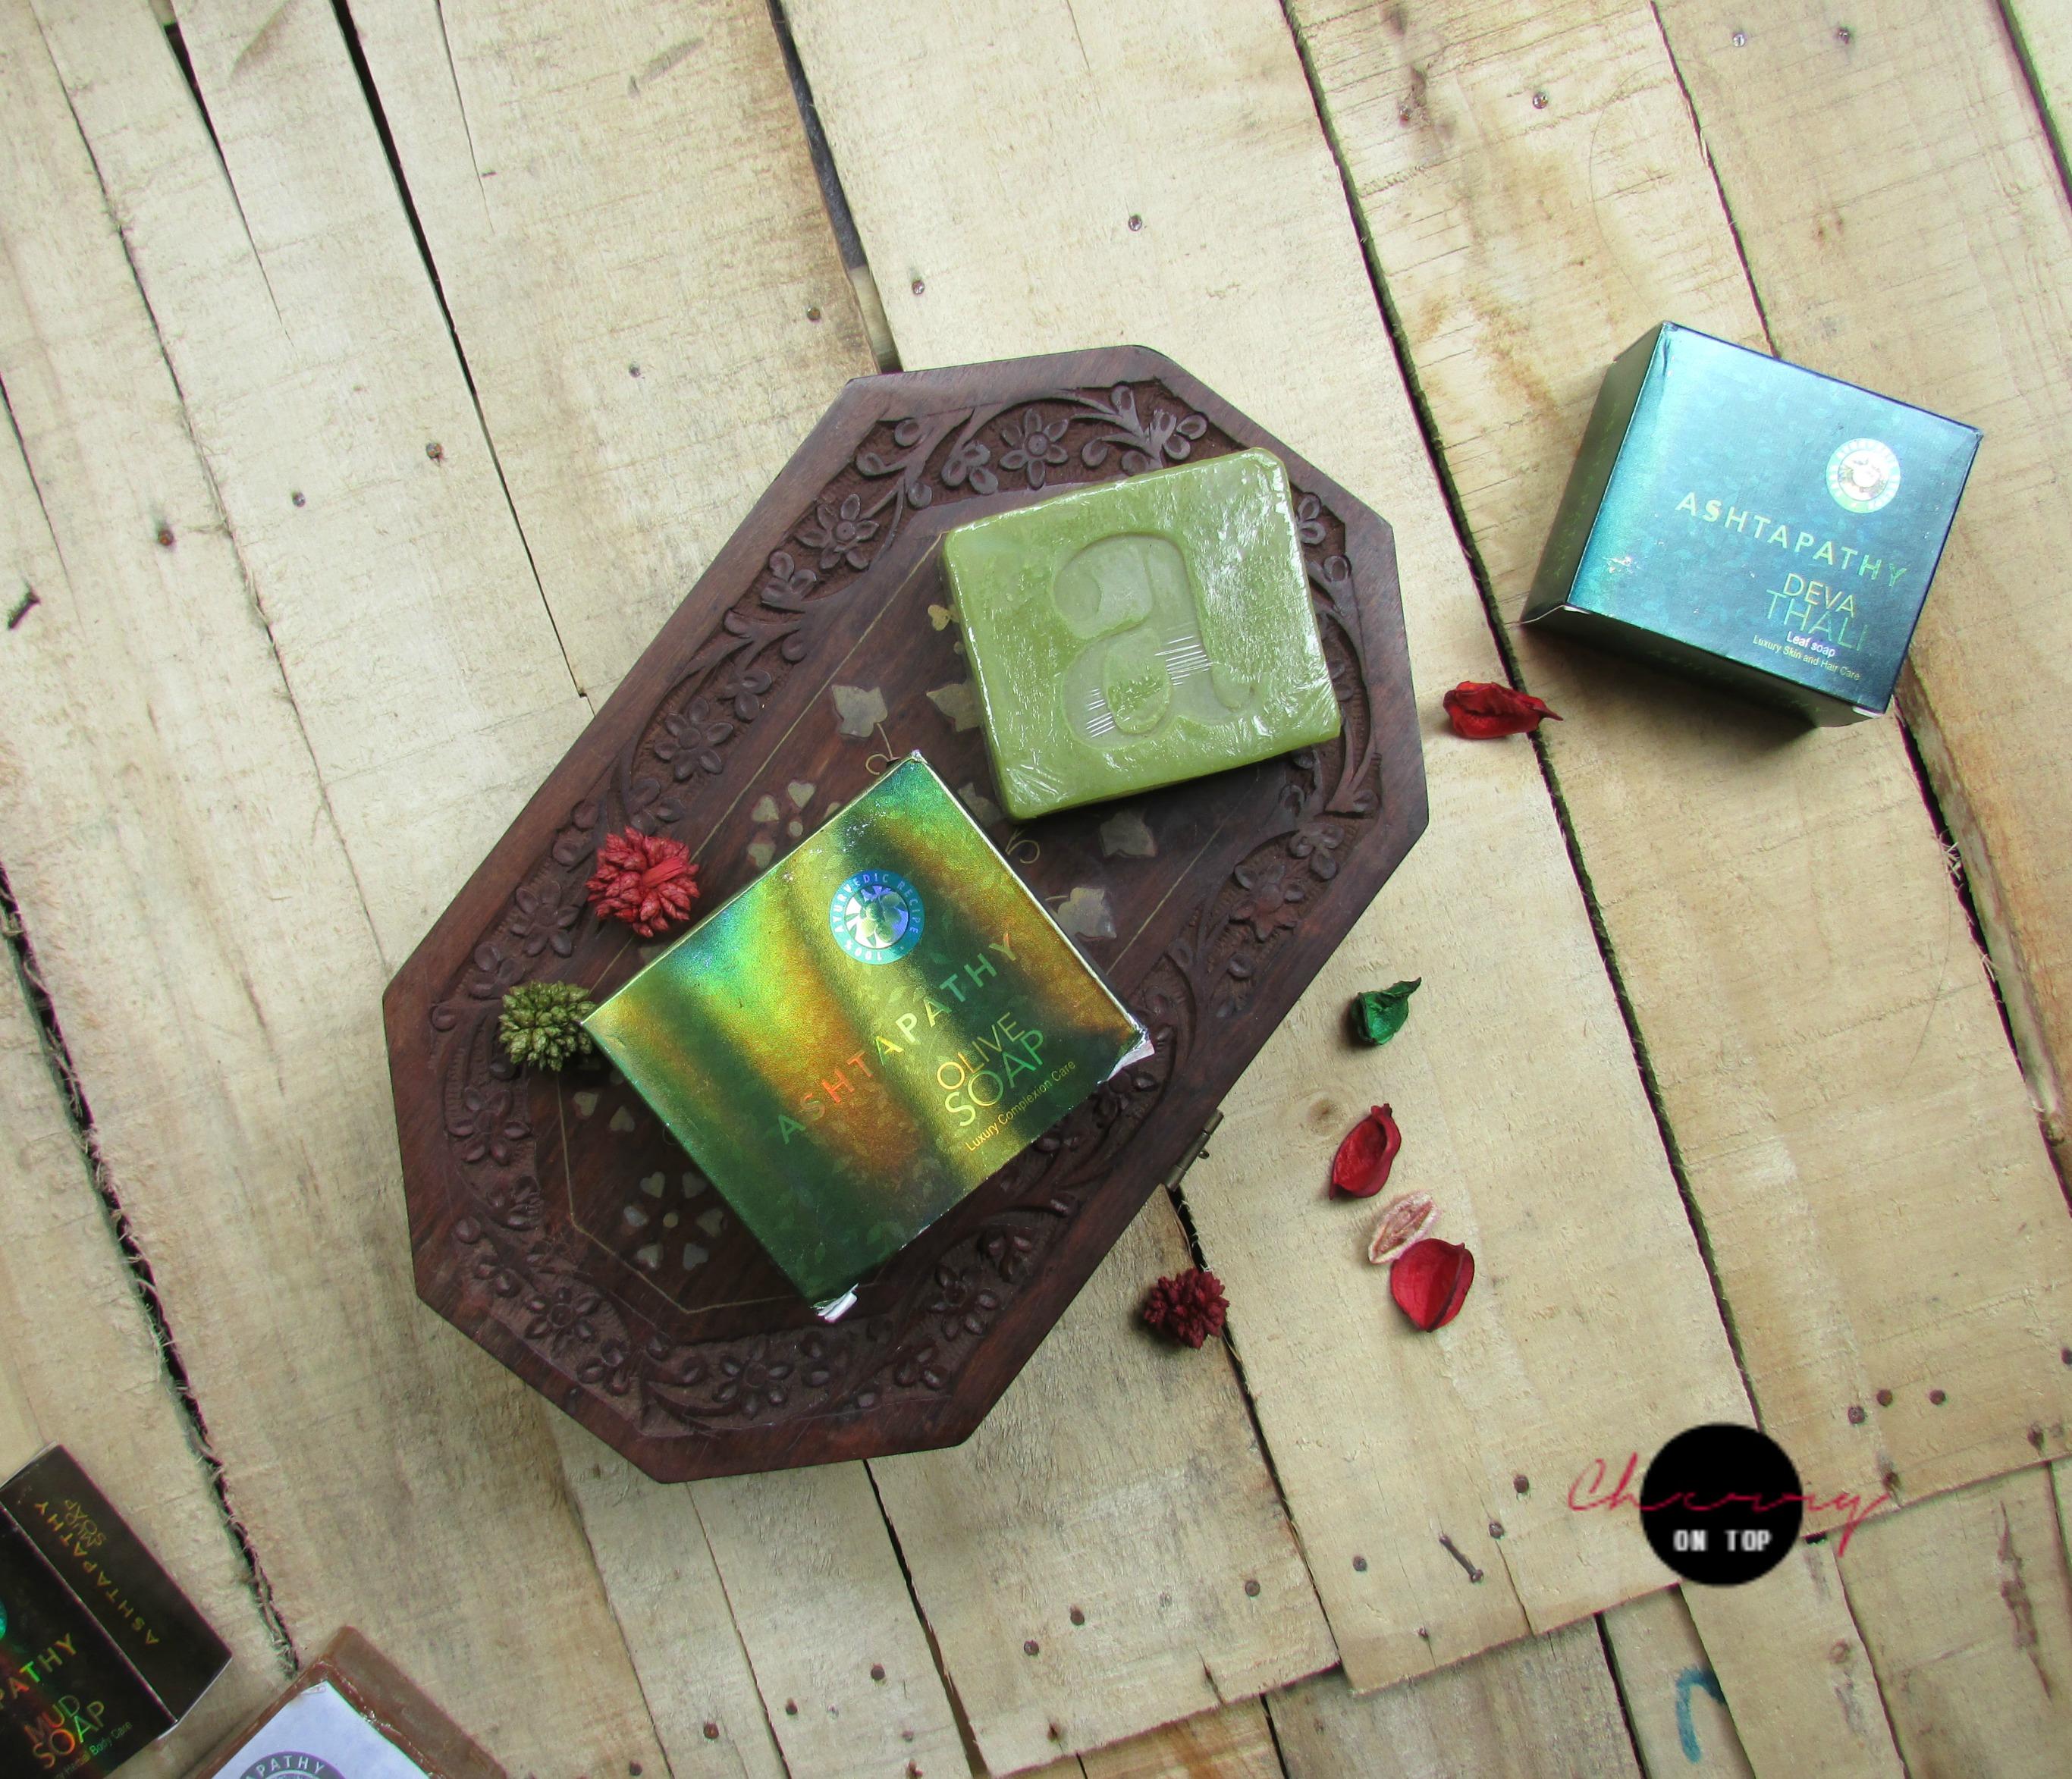 Ashtapathy Herbals Olive Soap Review